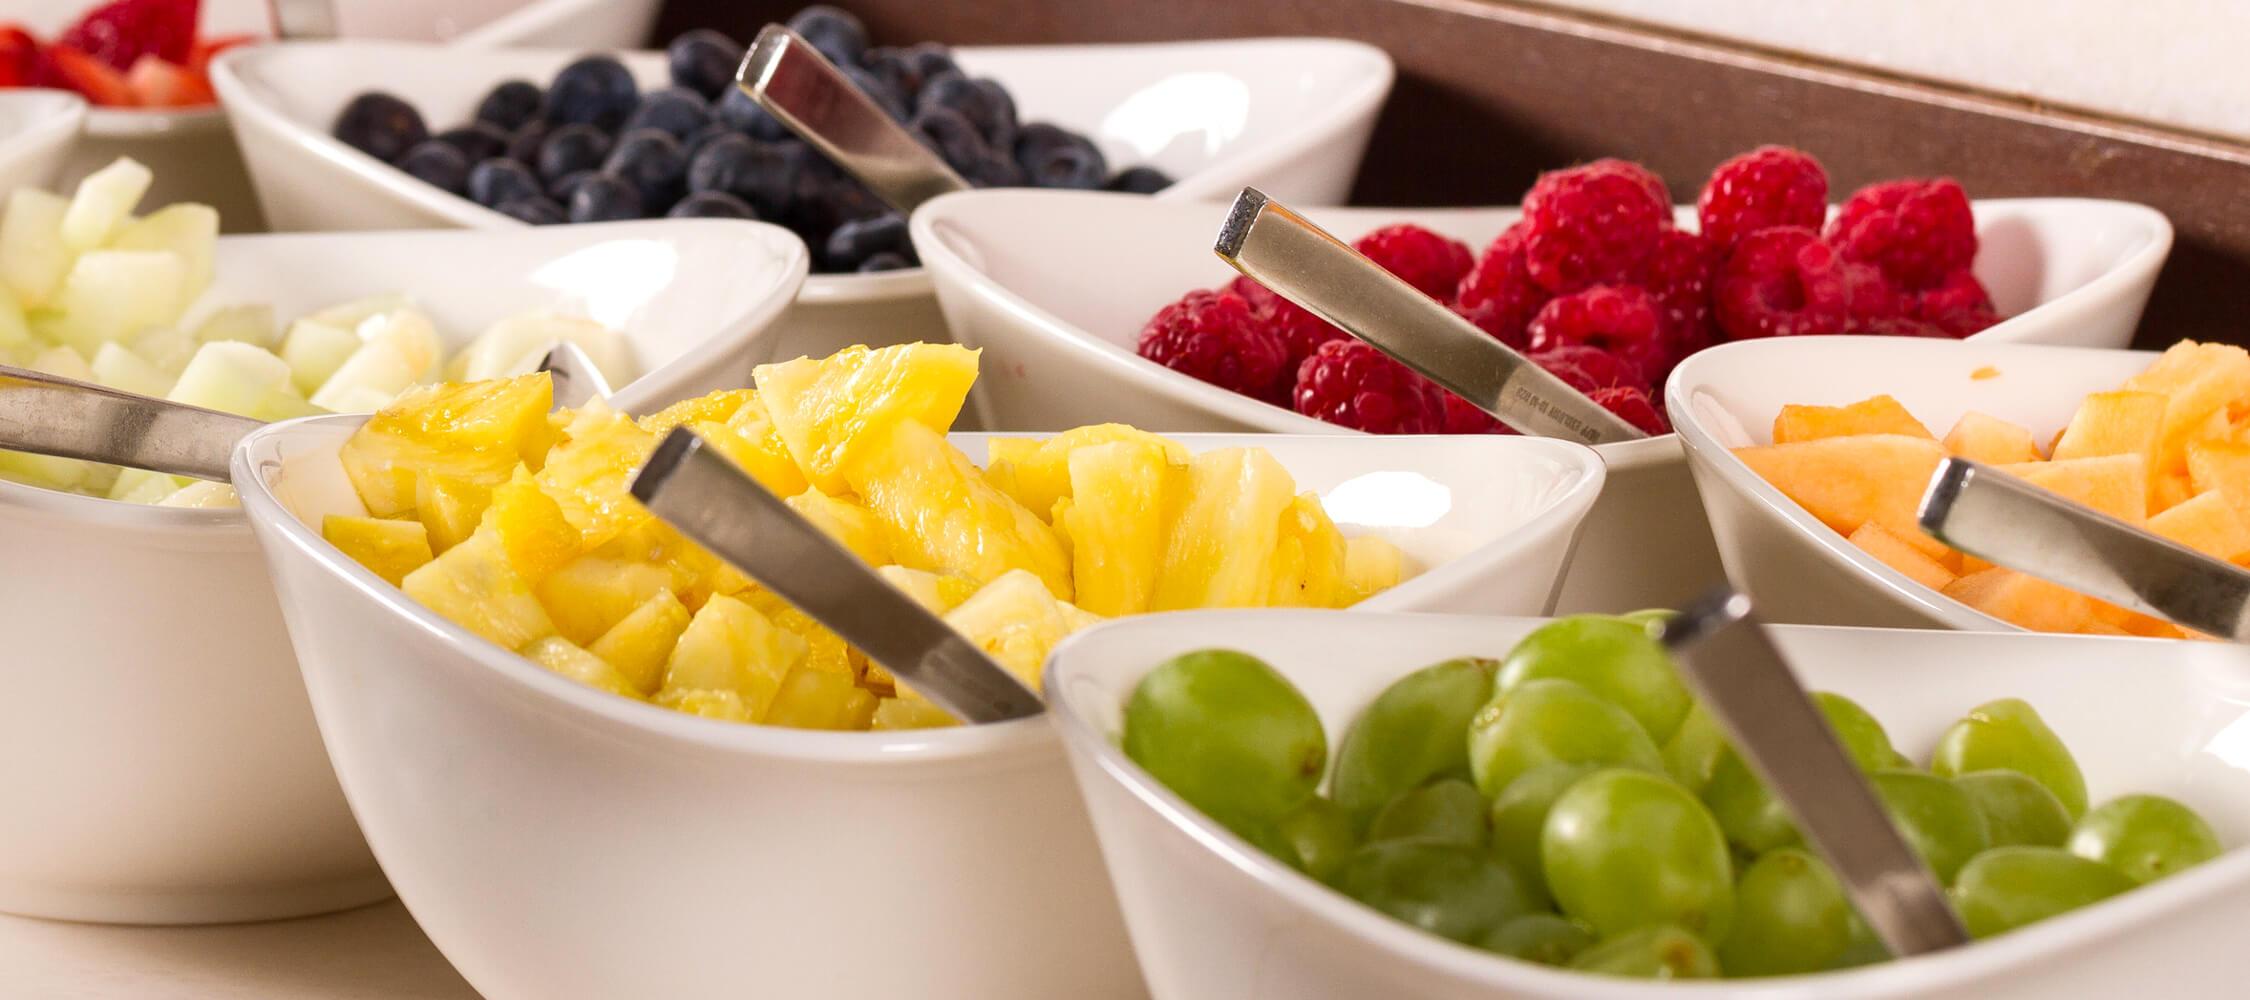 City Hotel Meran, Frühstücksbuffet, große Auswahl, Rohkost, Müsli, Obst, regionale Produkte